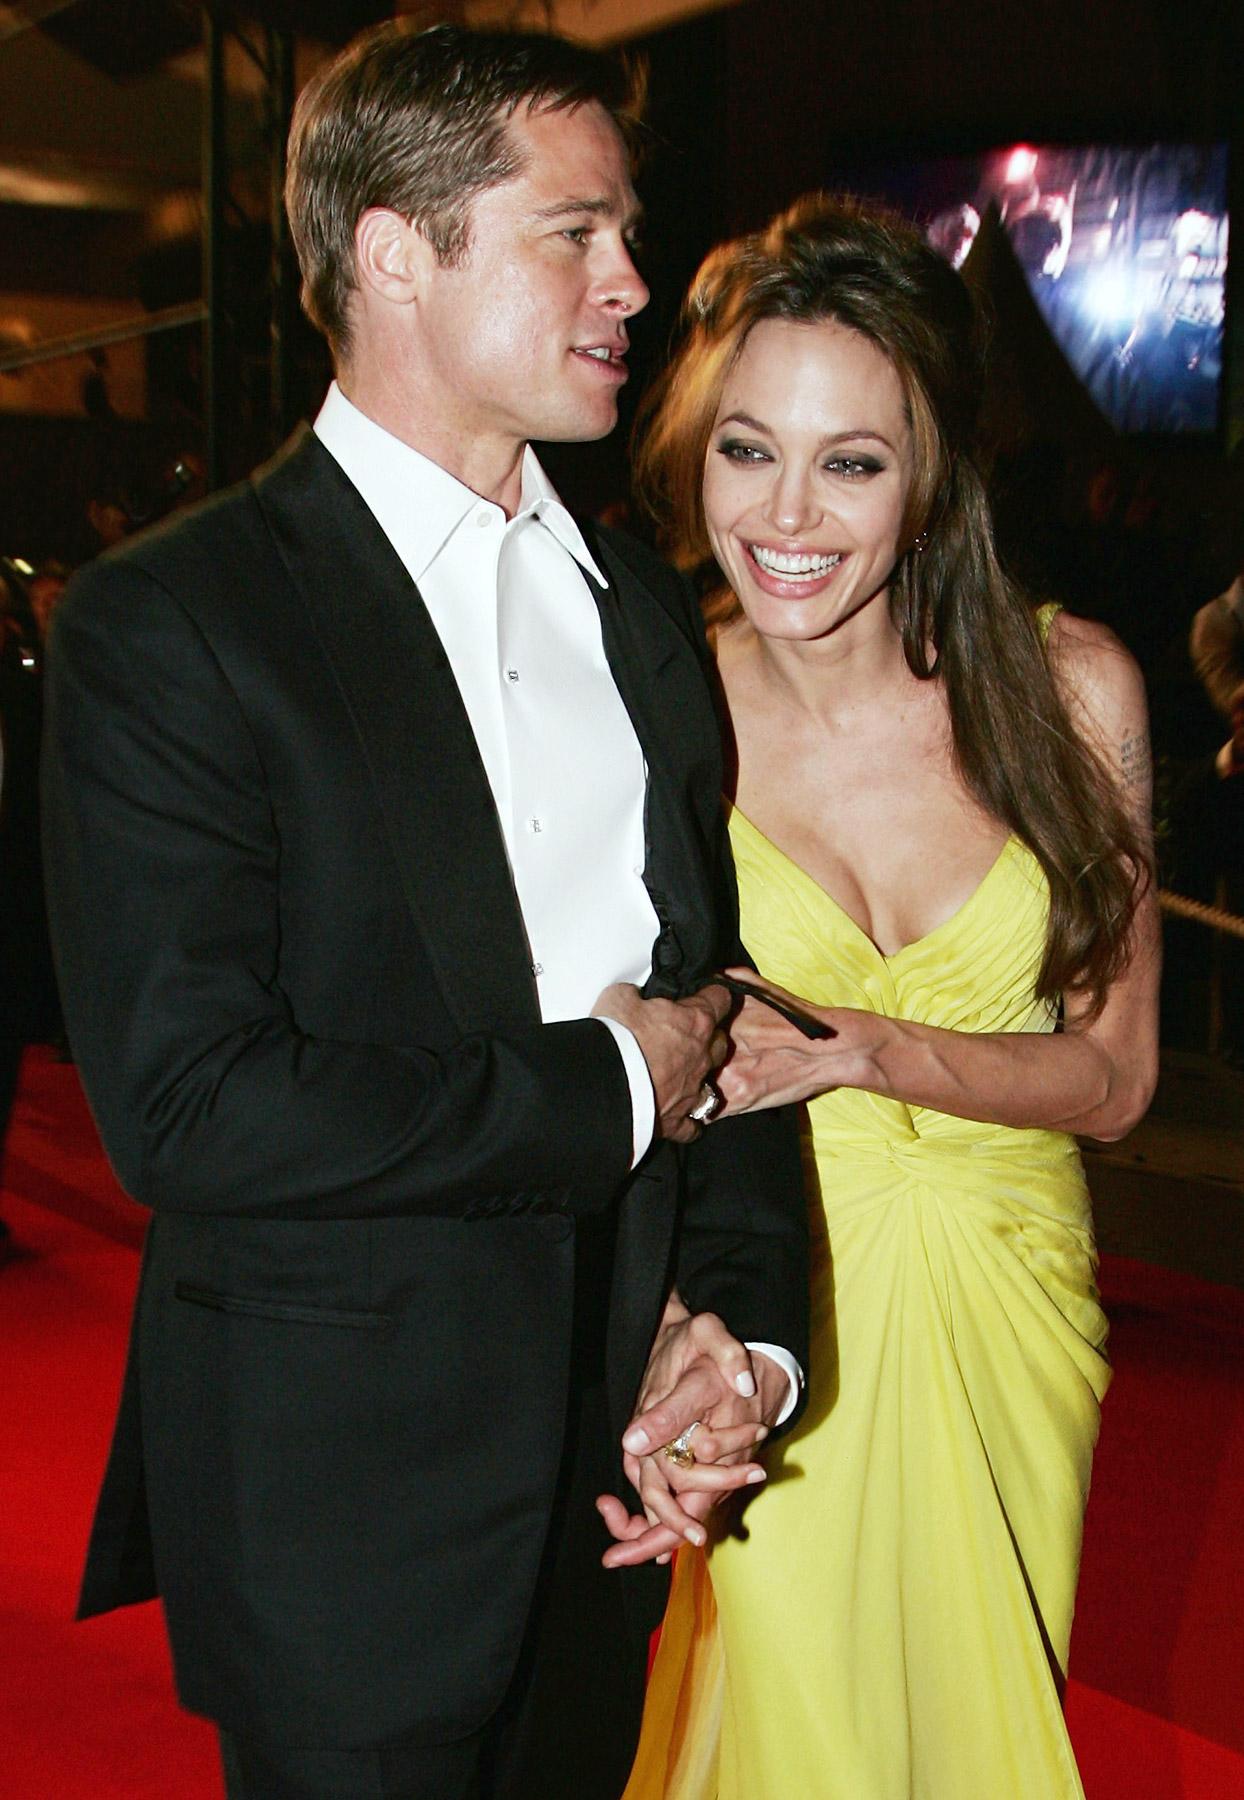 Jolie & Pitt Secretly Married | www.raveituptv.com